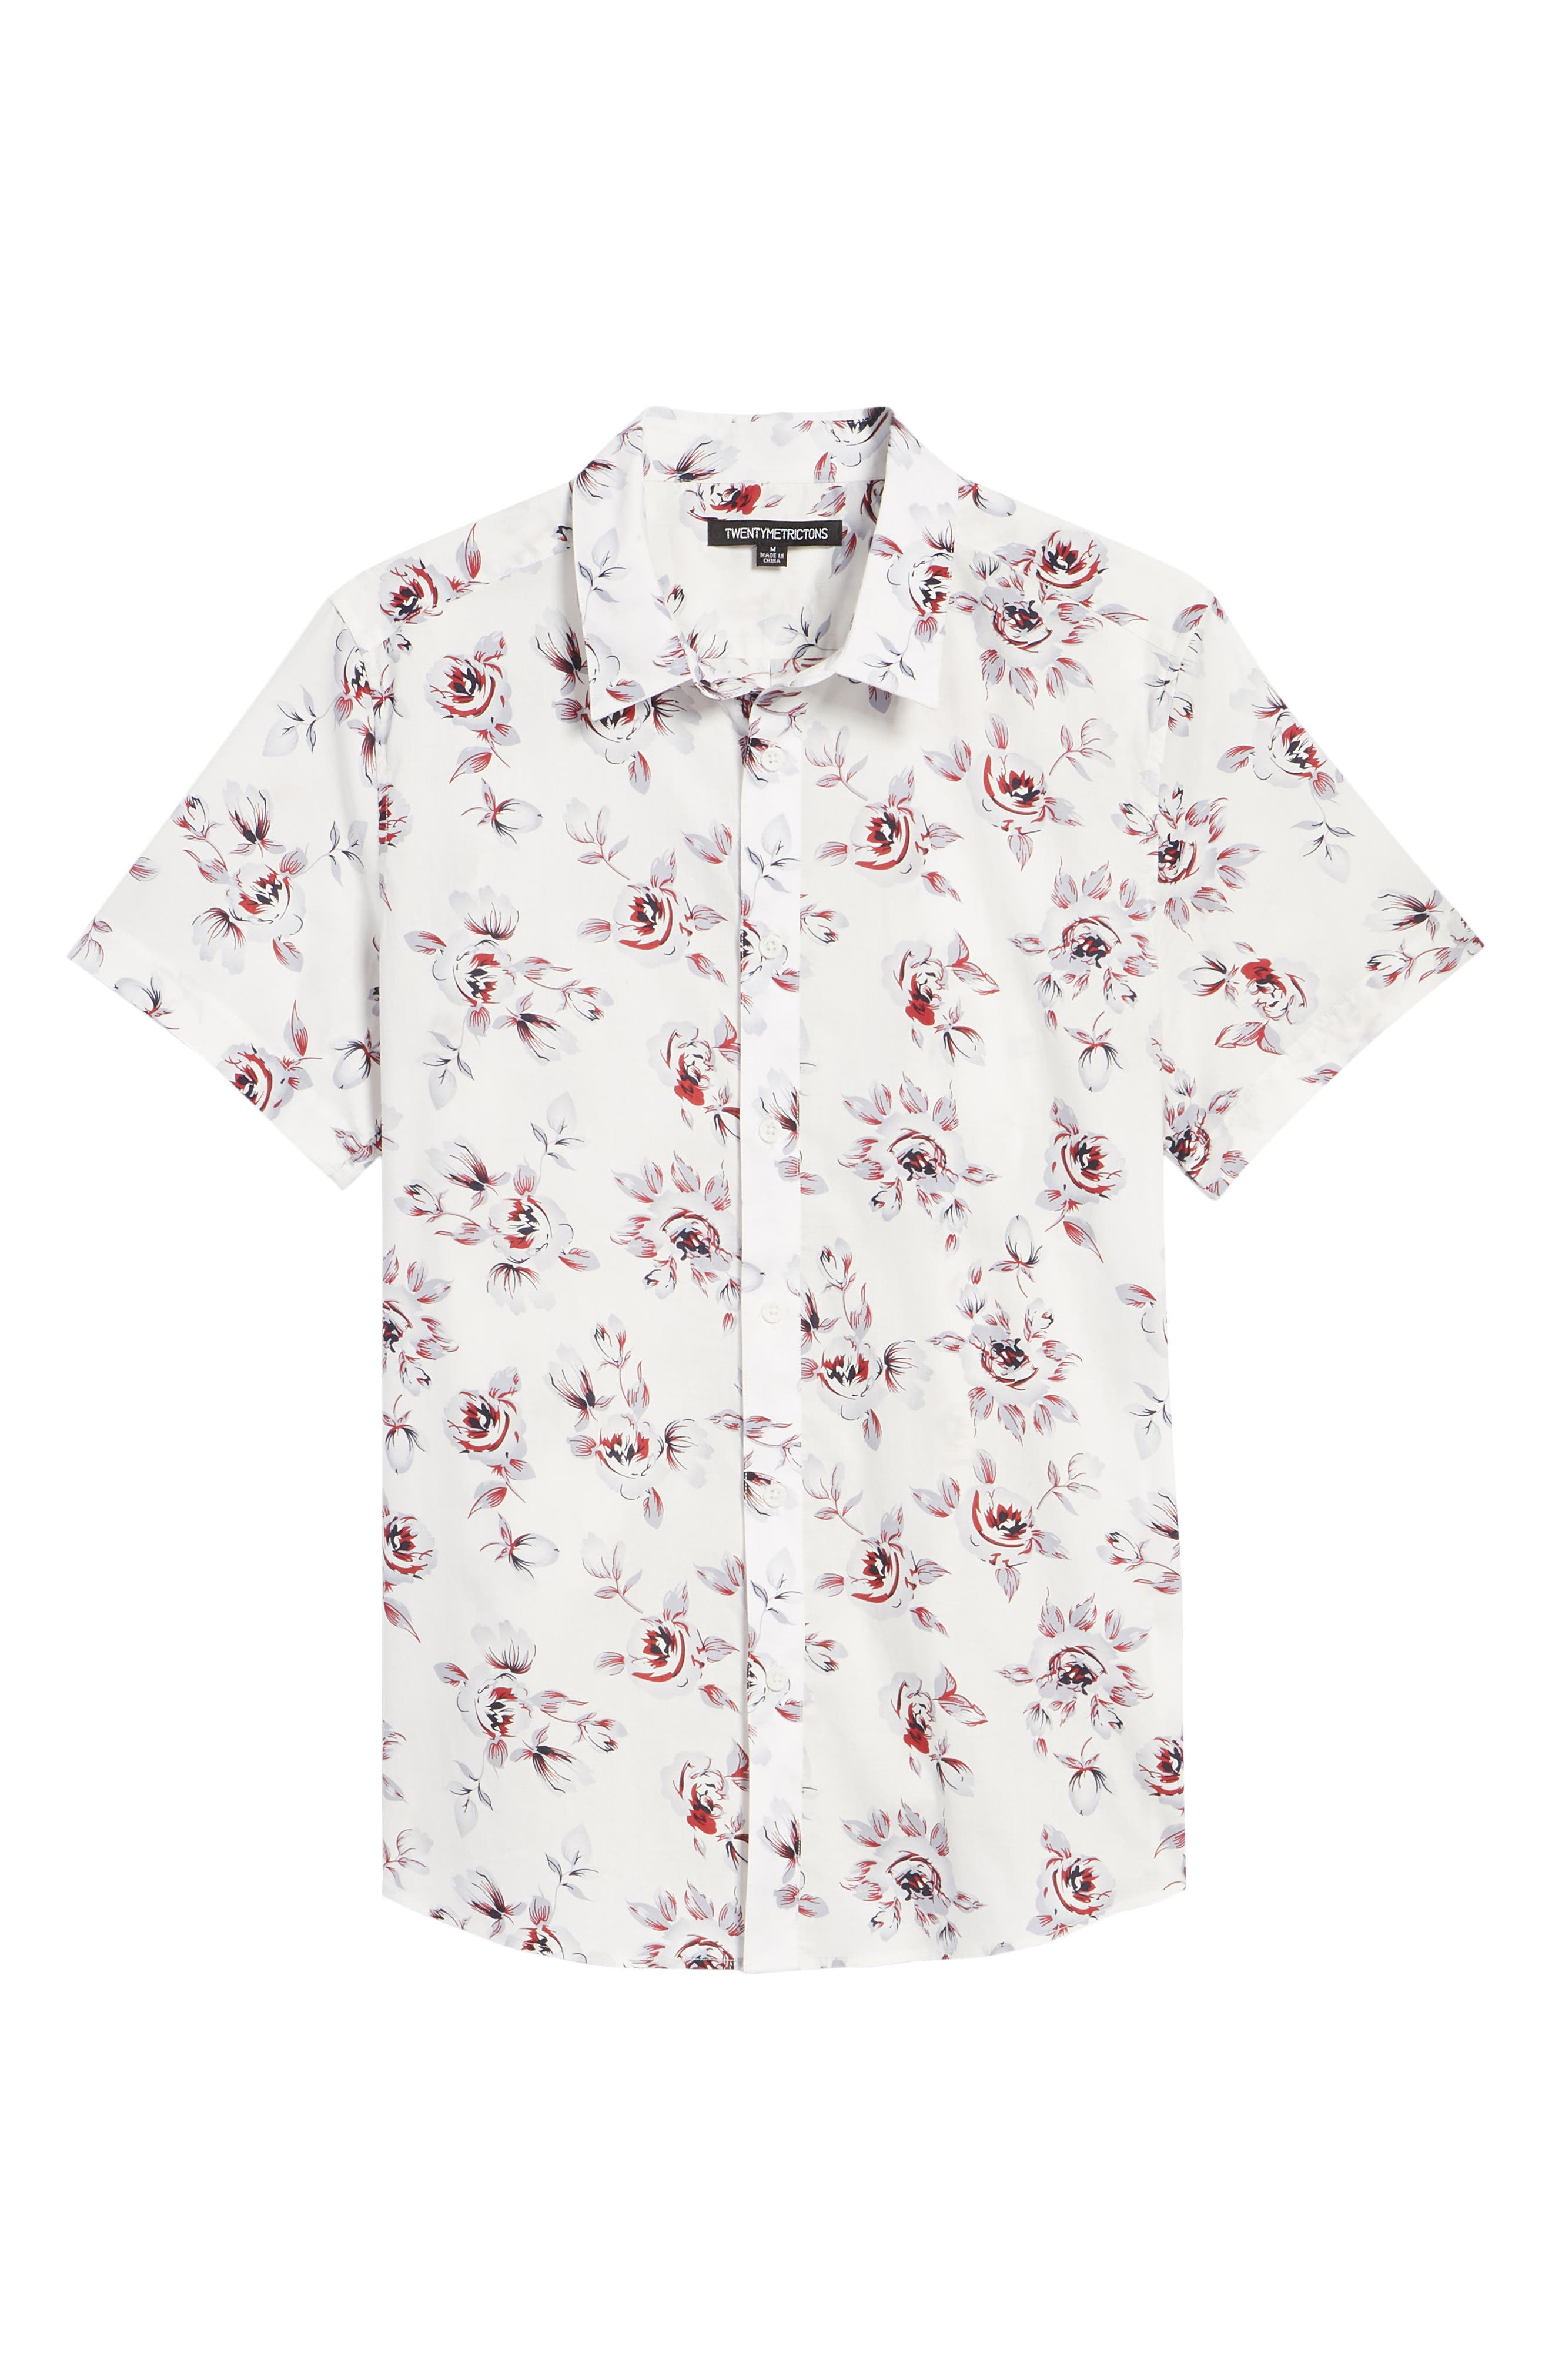 Trim Fit Print Woven Short Sleeve Shirt,                             Alternate thumbnail 6, color,                             White Red Rose